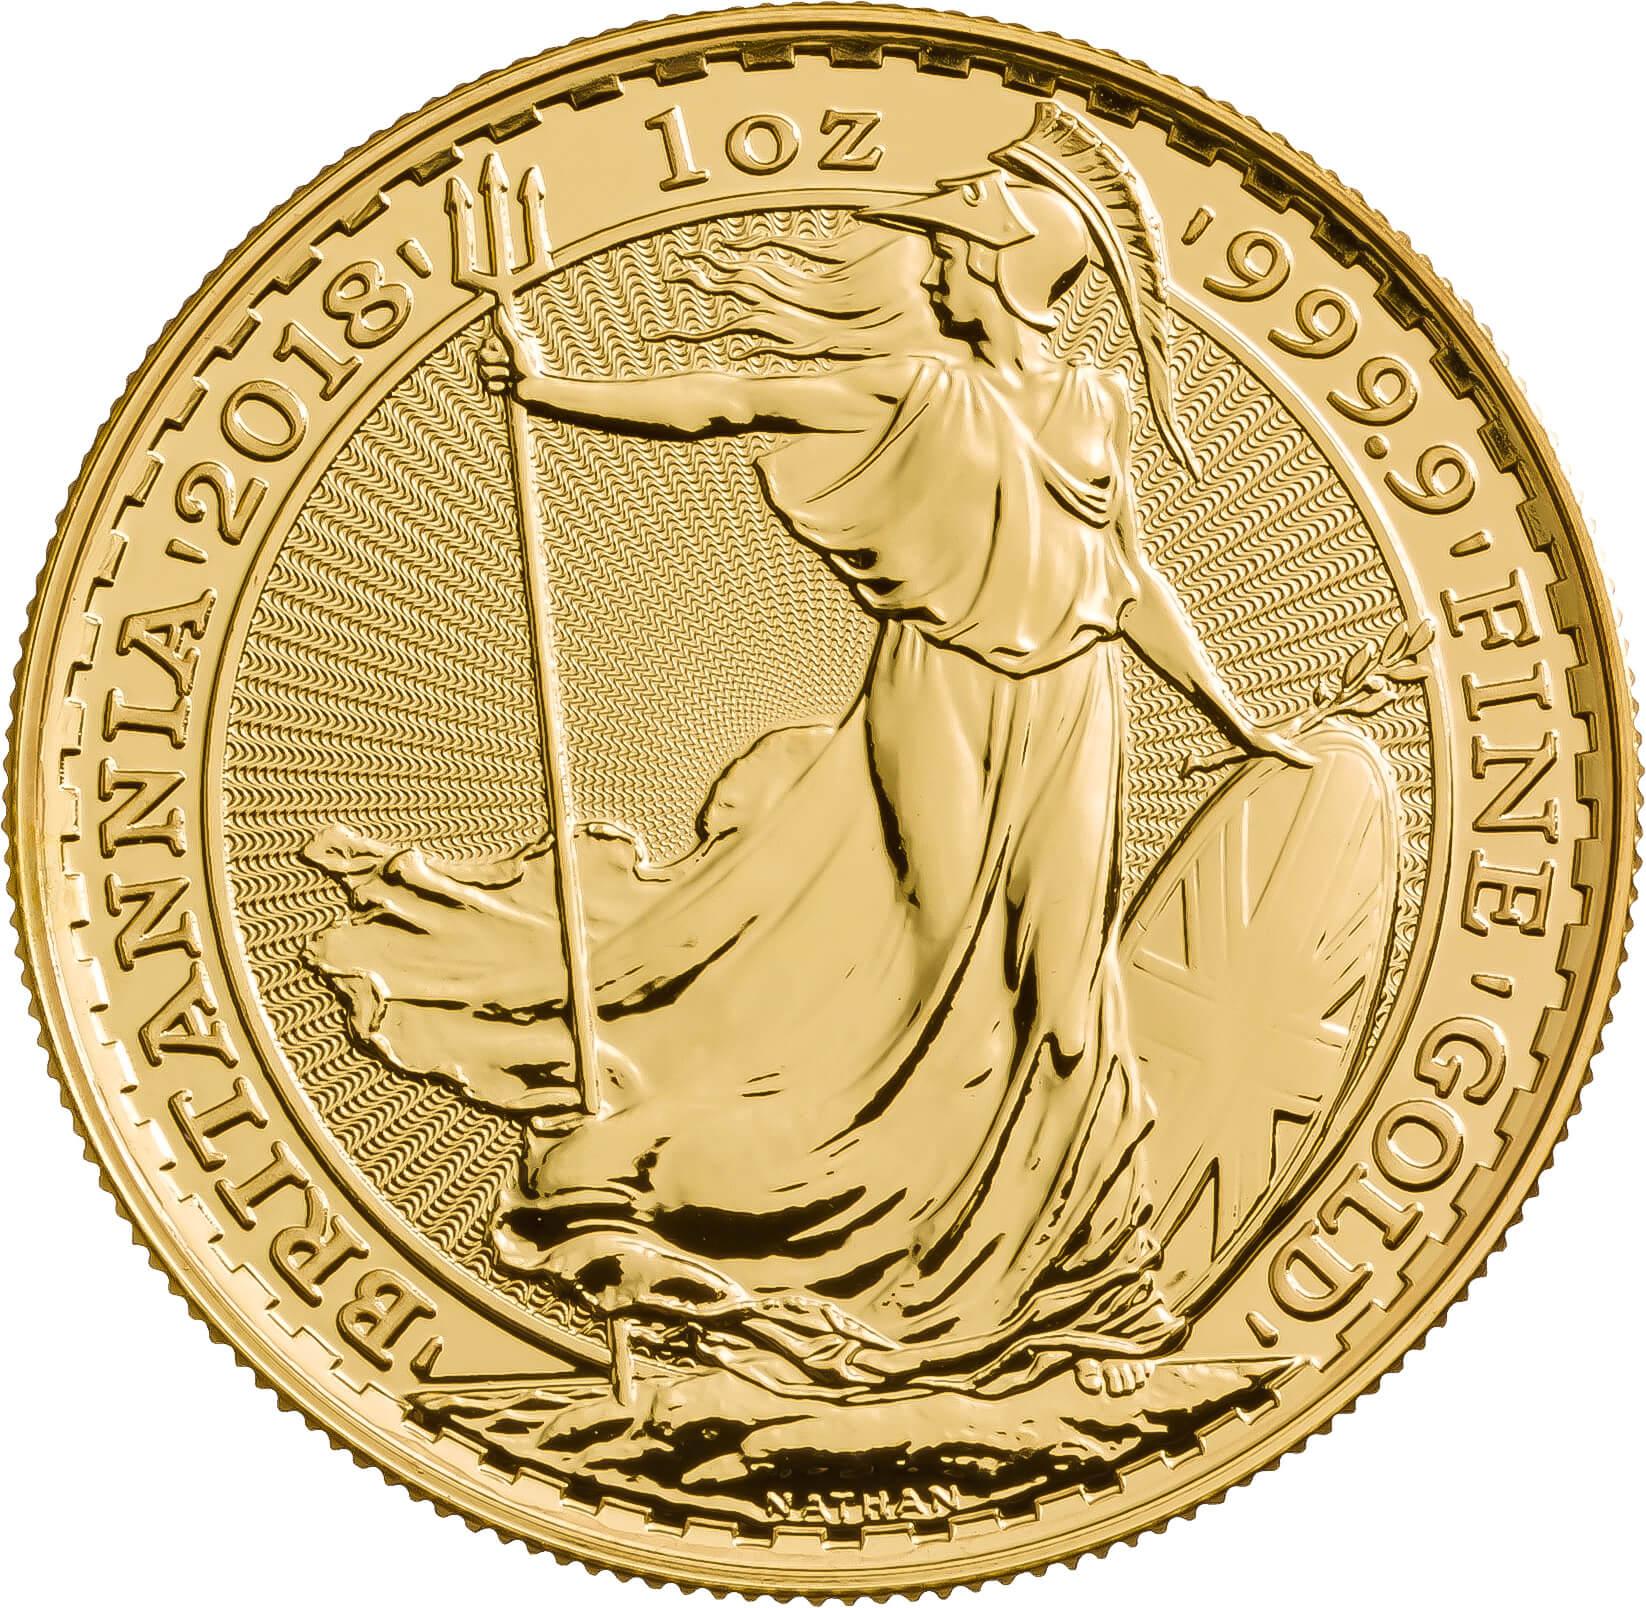 2018 Britannia One Ounce Gold Coin